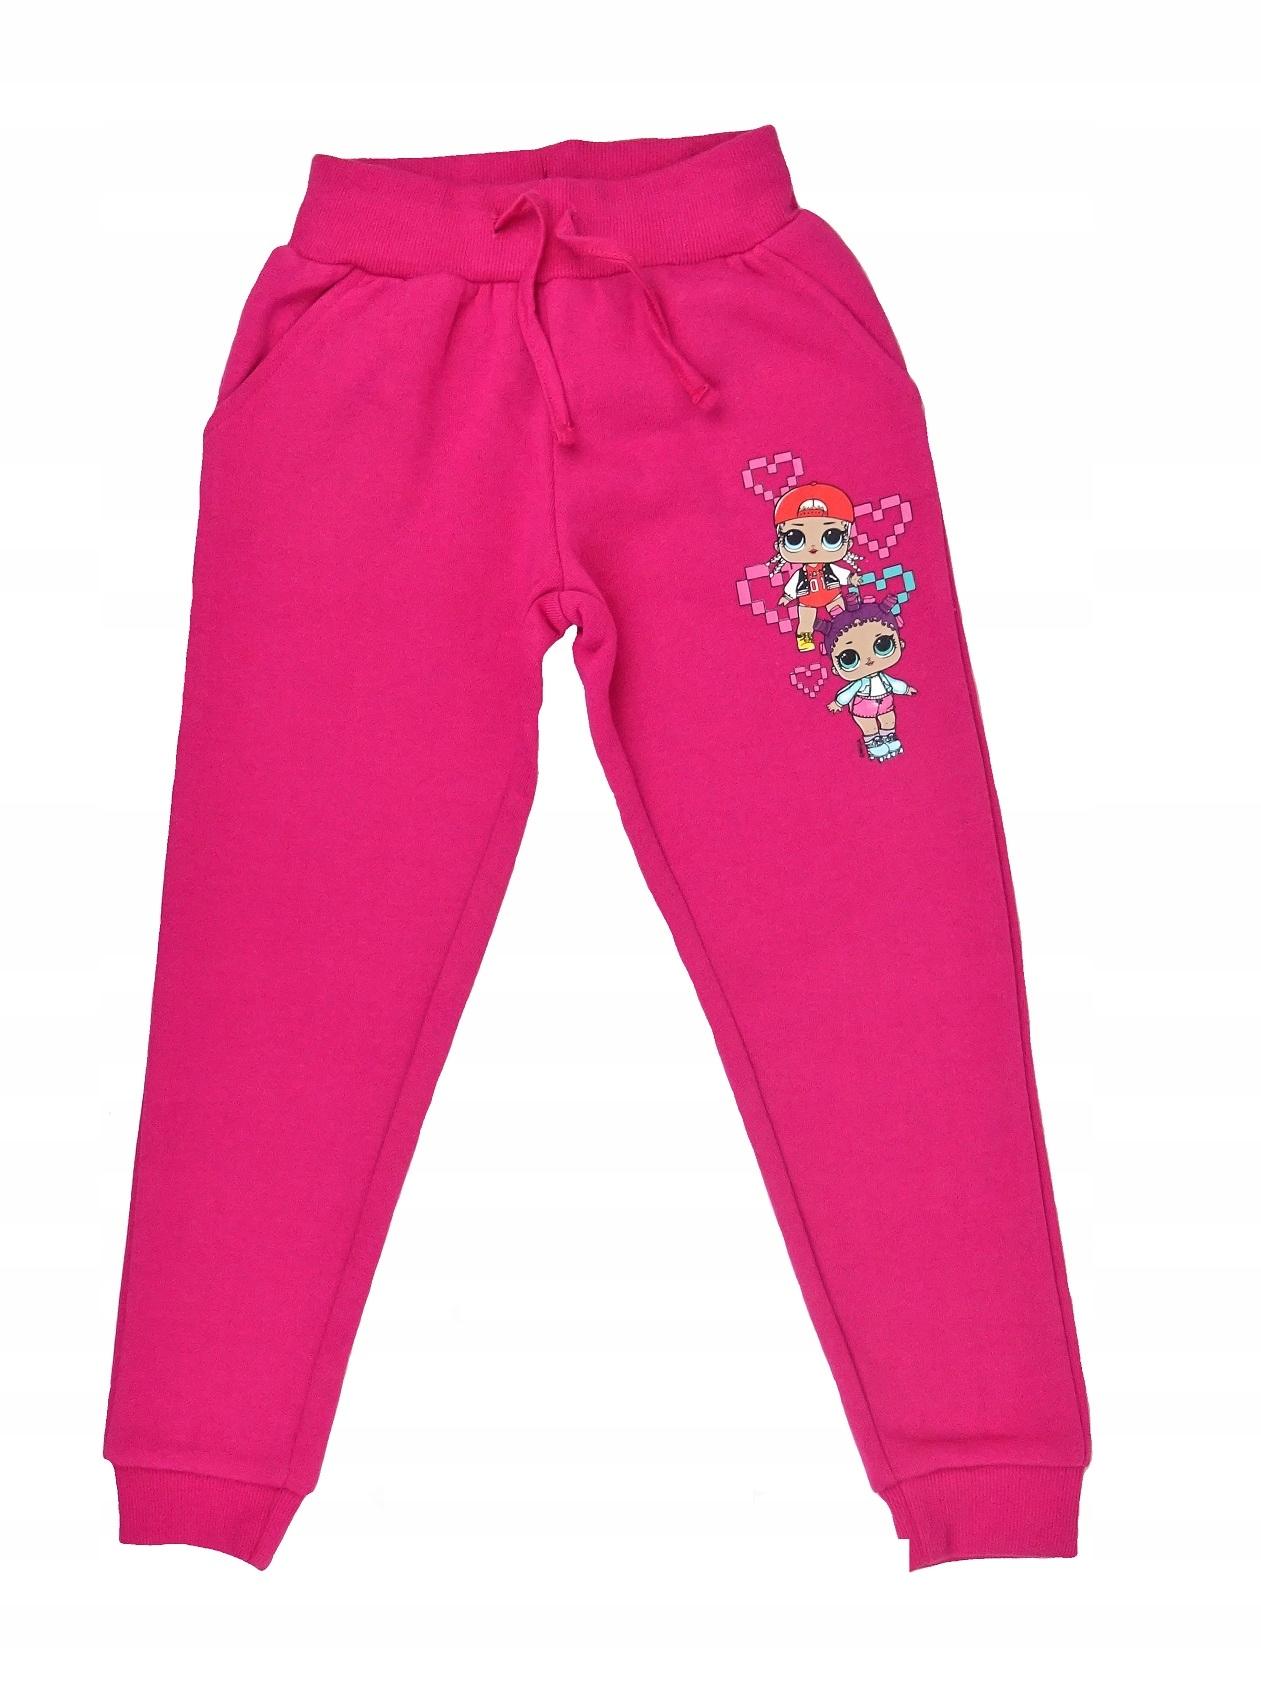 športové zateplené nohavice LOL L. O. L. 140 PREKVAPENIE